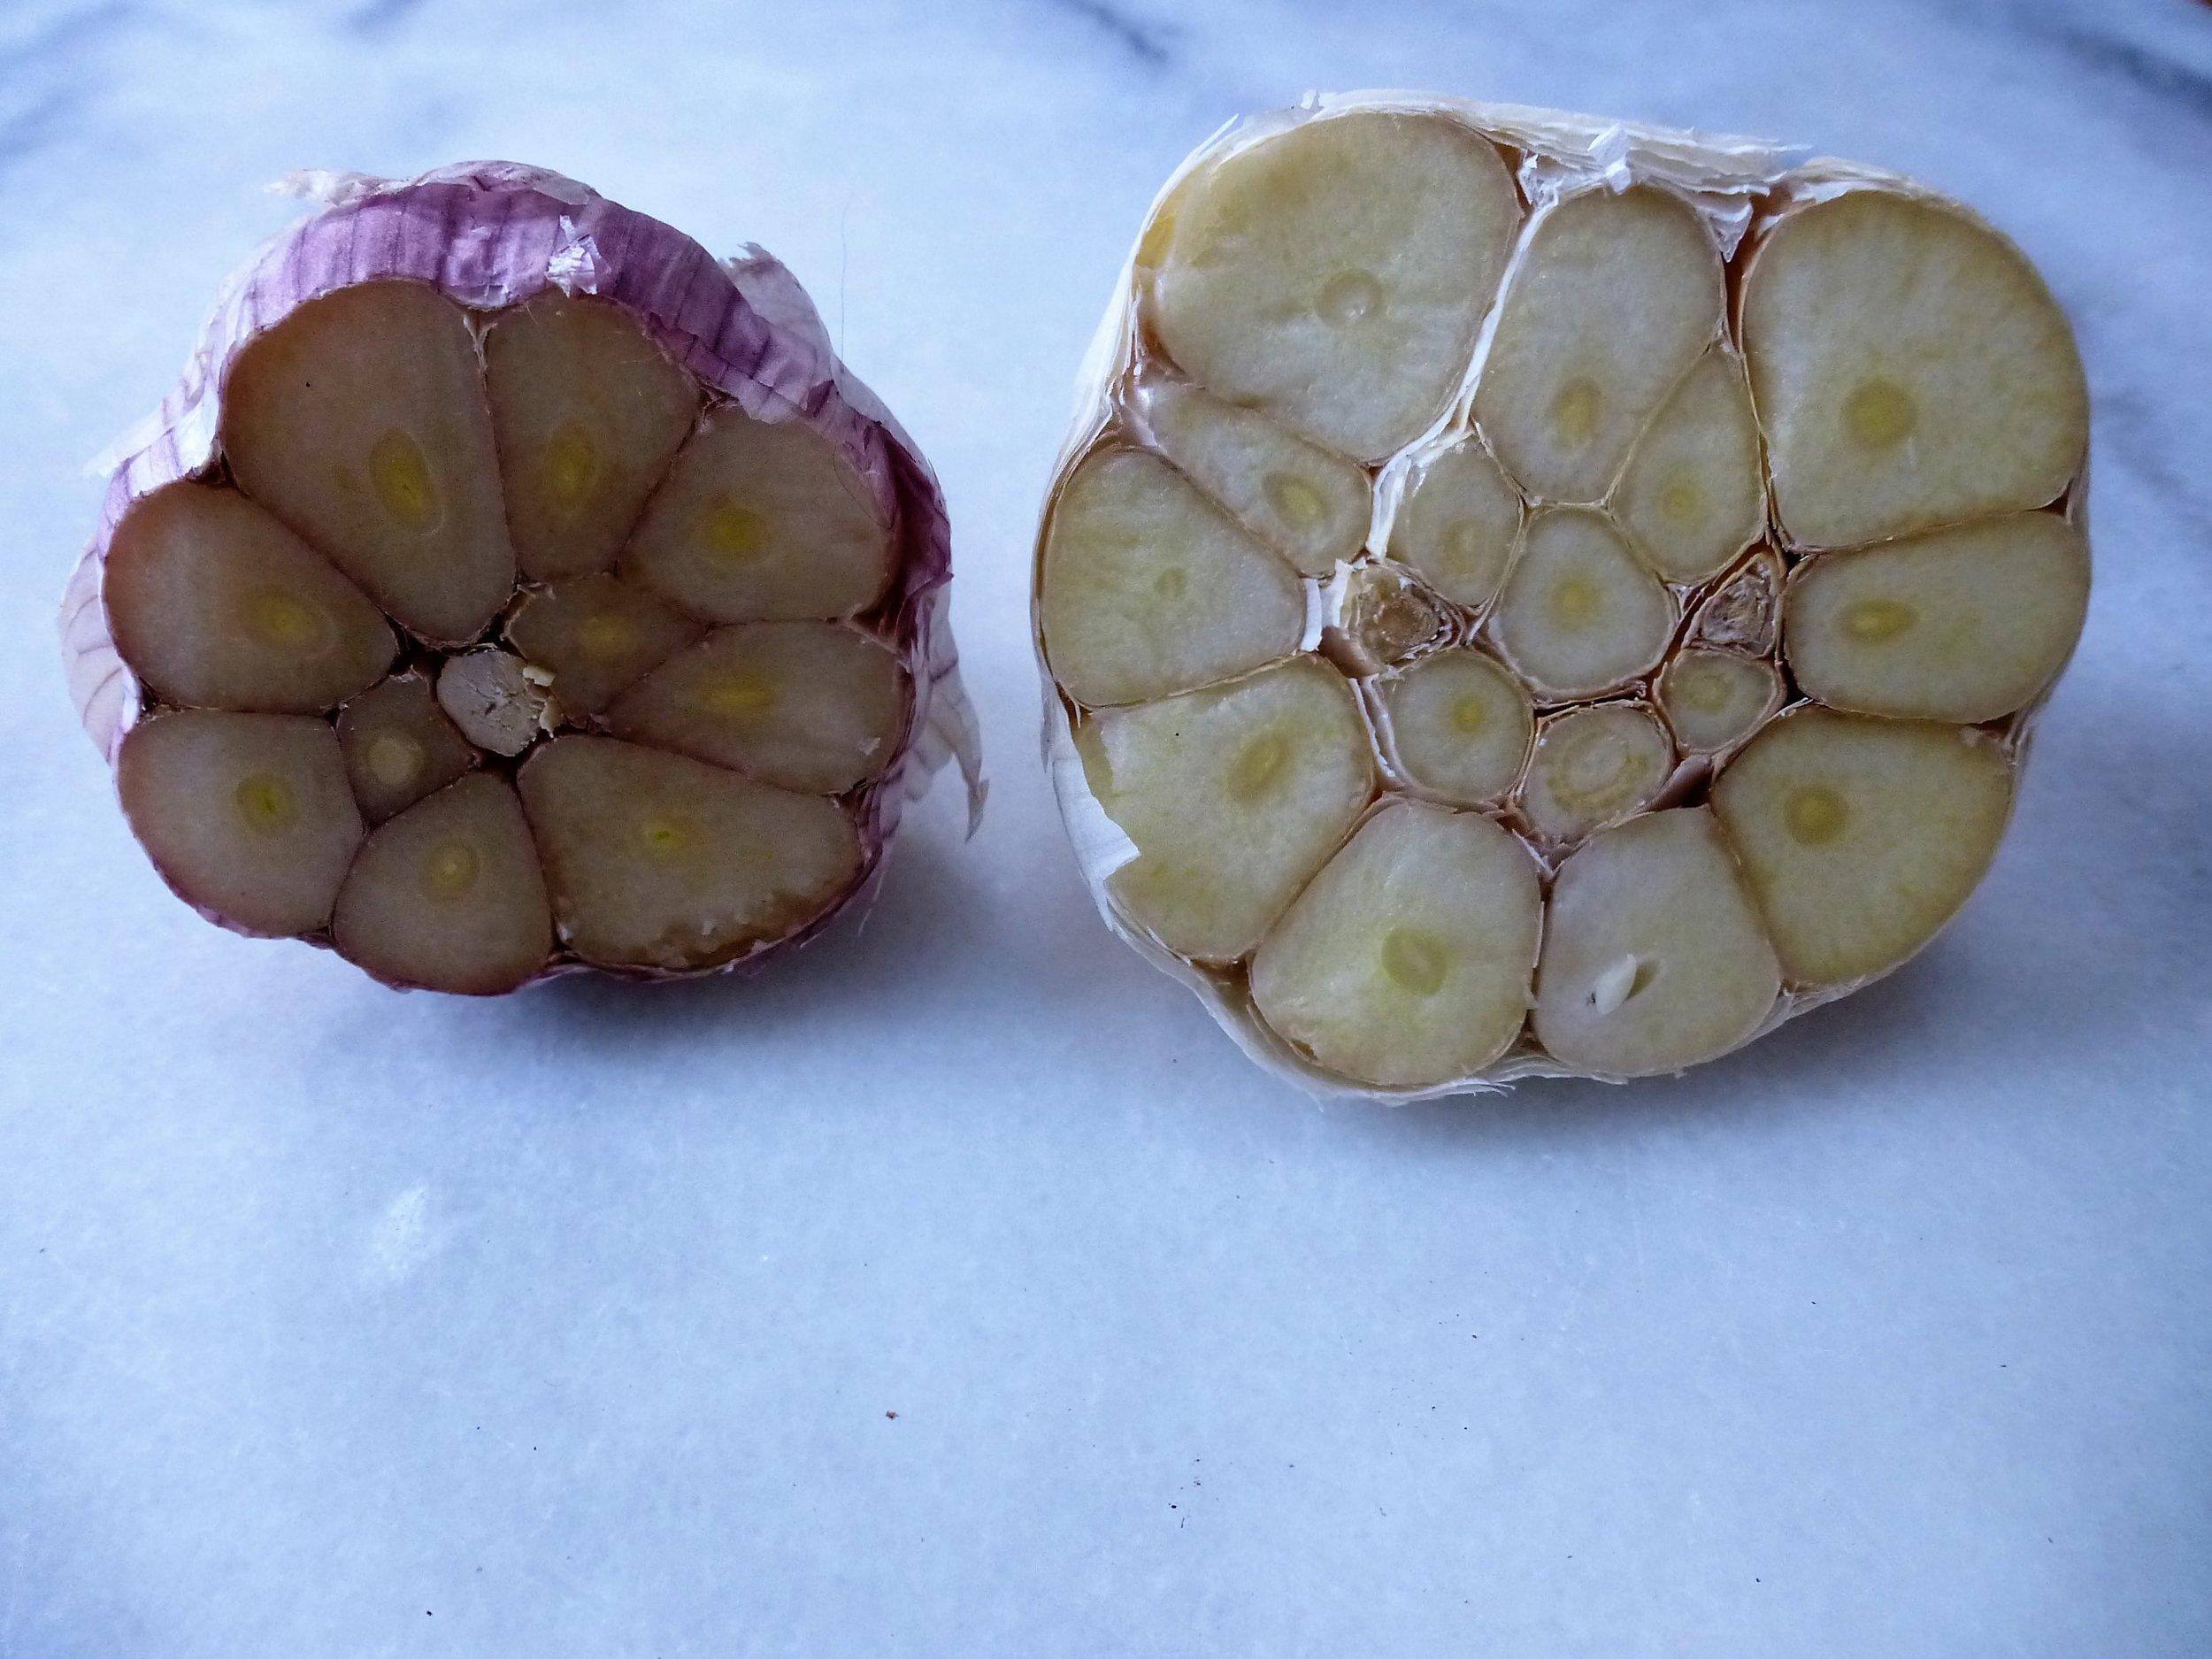 Hardneck garlic (left) and Softneck garlic (right)